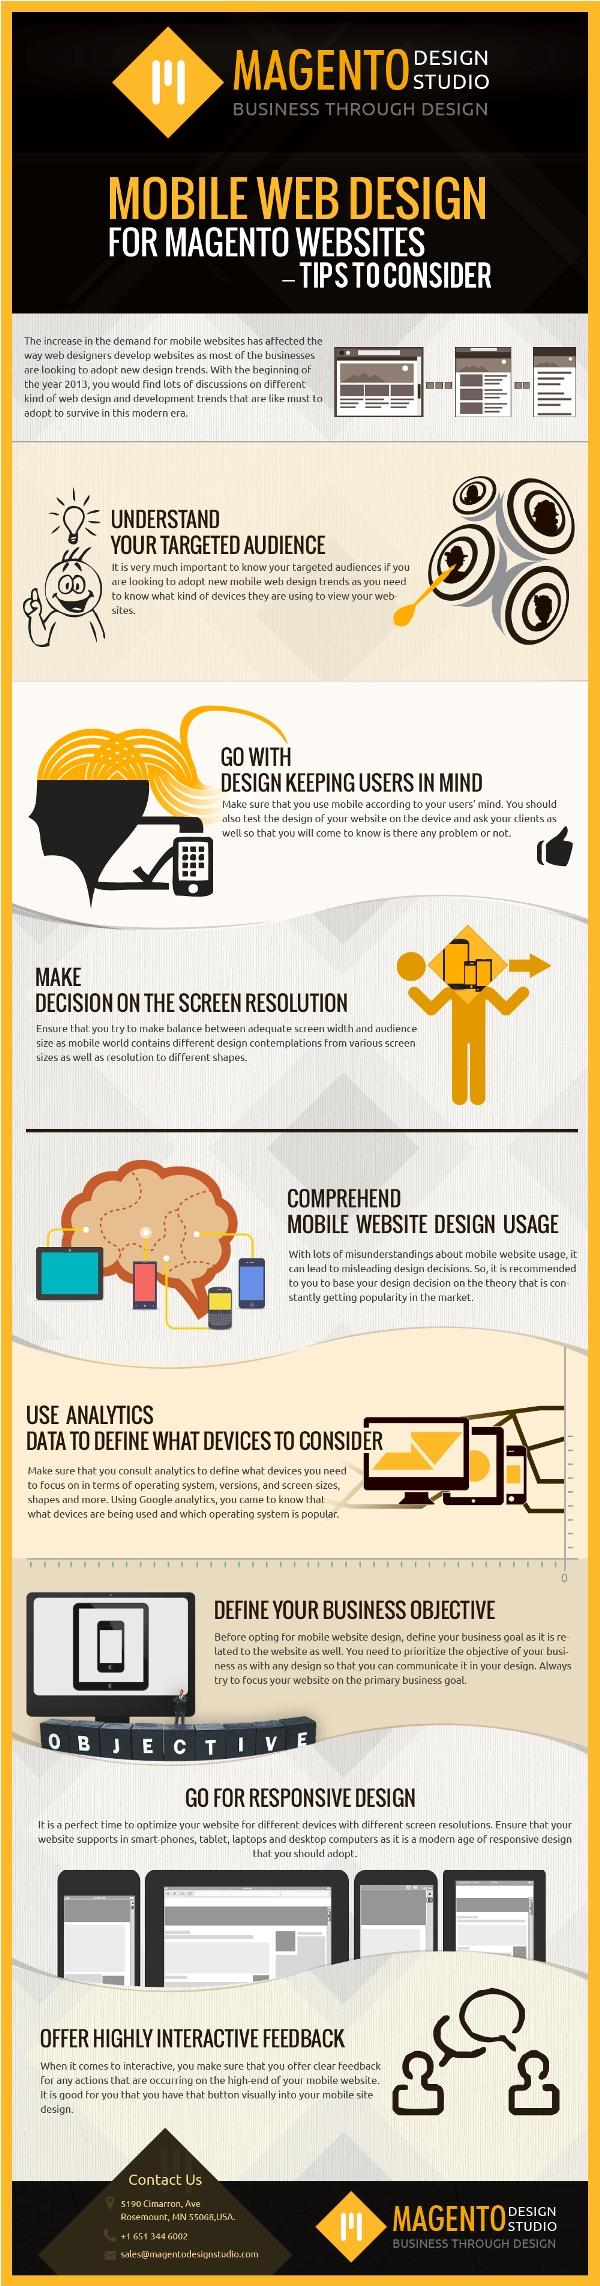 mobile-web-design-for-magento-websites--tips-to-consider_522d71297b43a.jpg 2